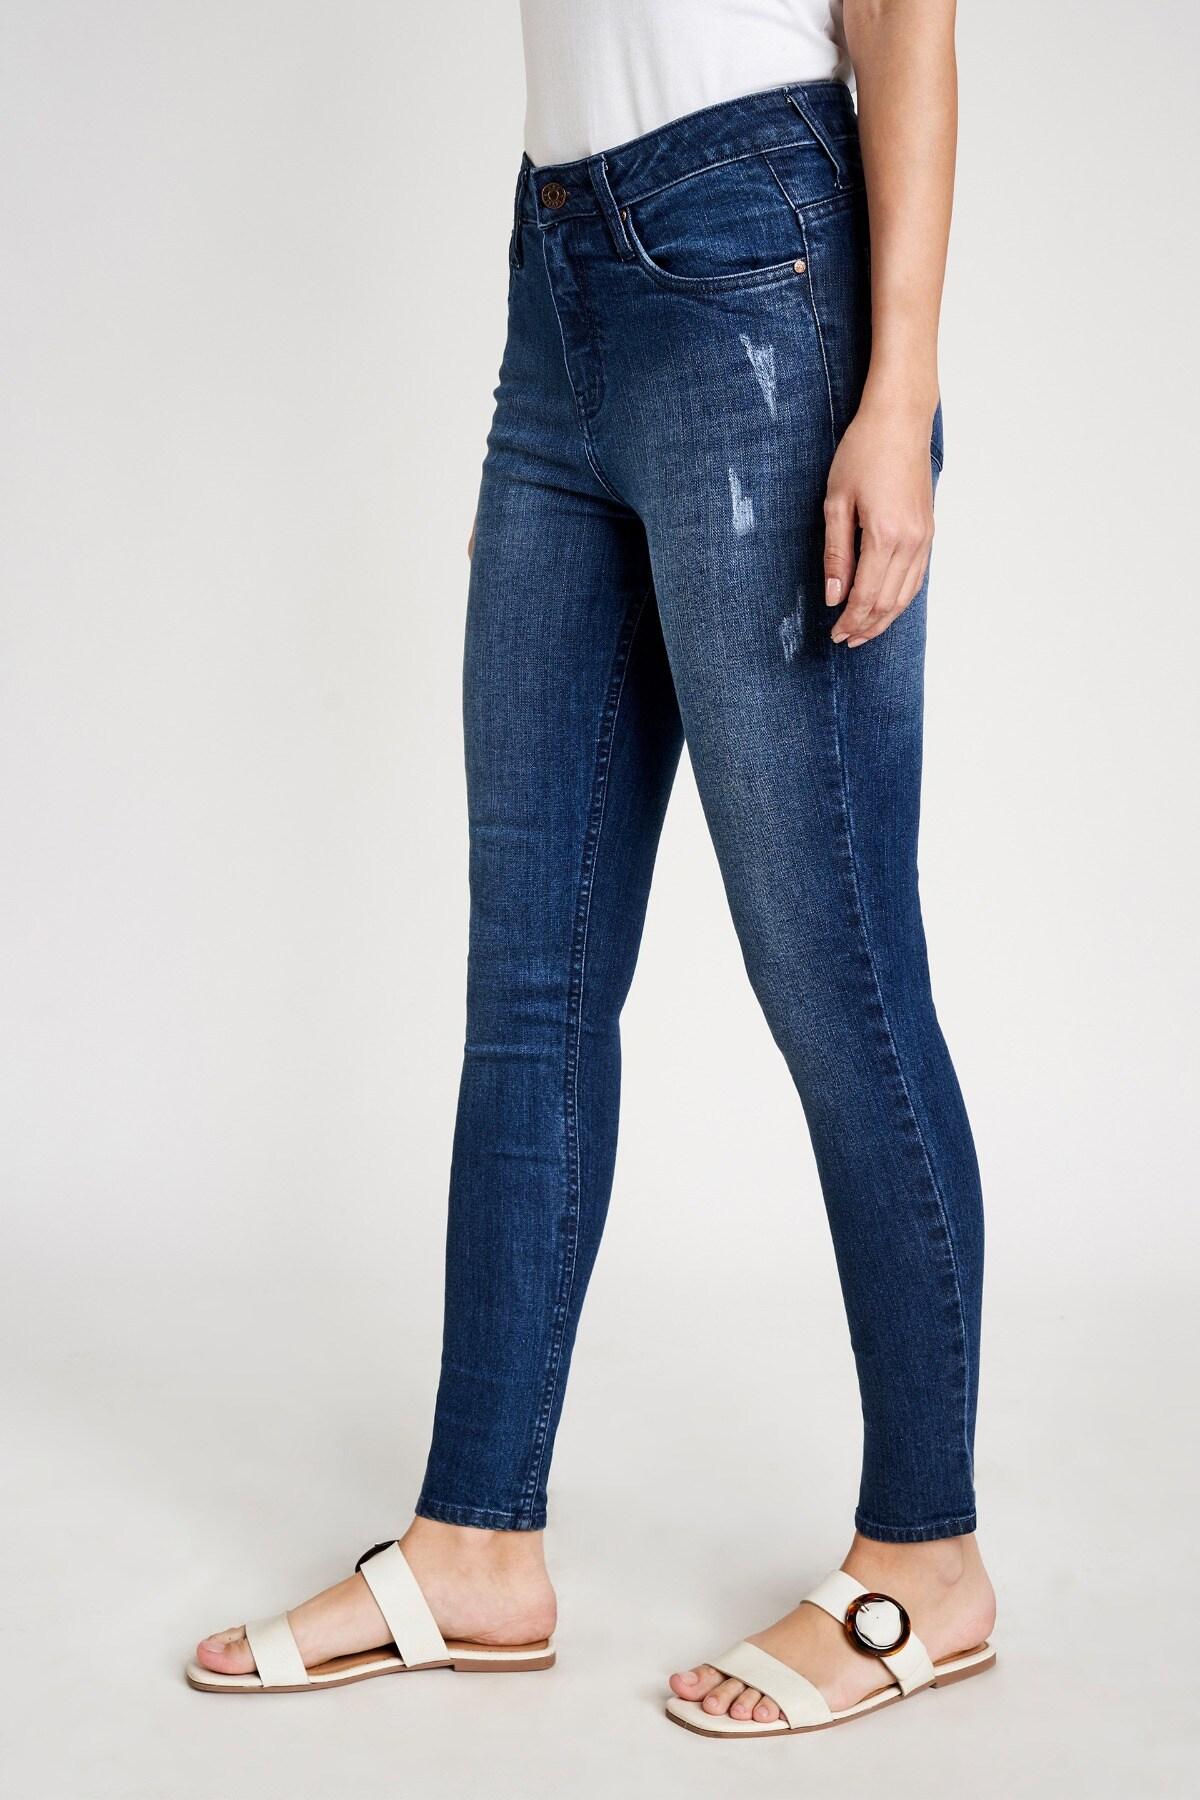 AND   Nora Dark Blue Skinny Jeans